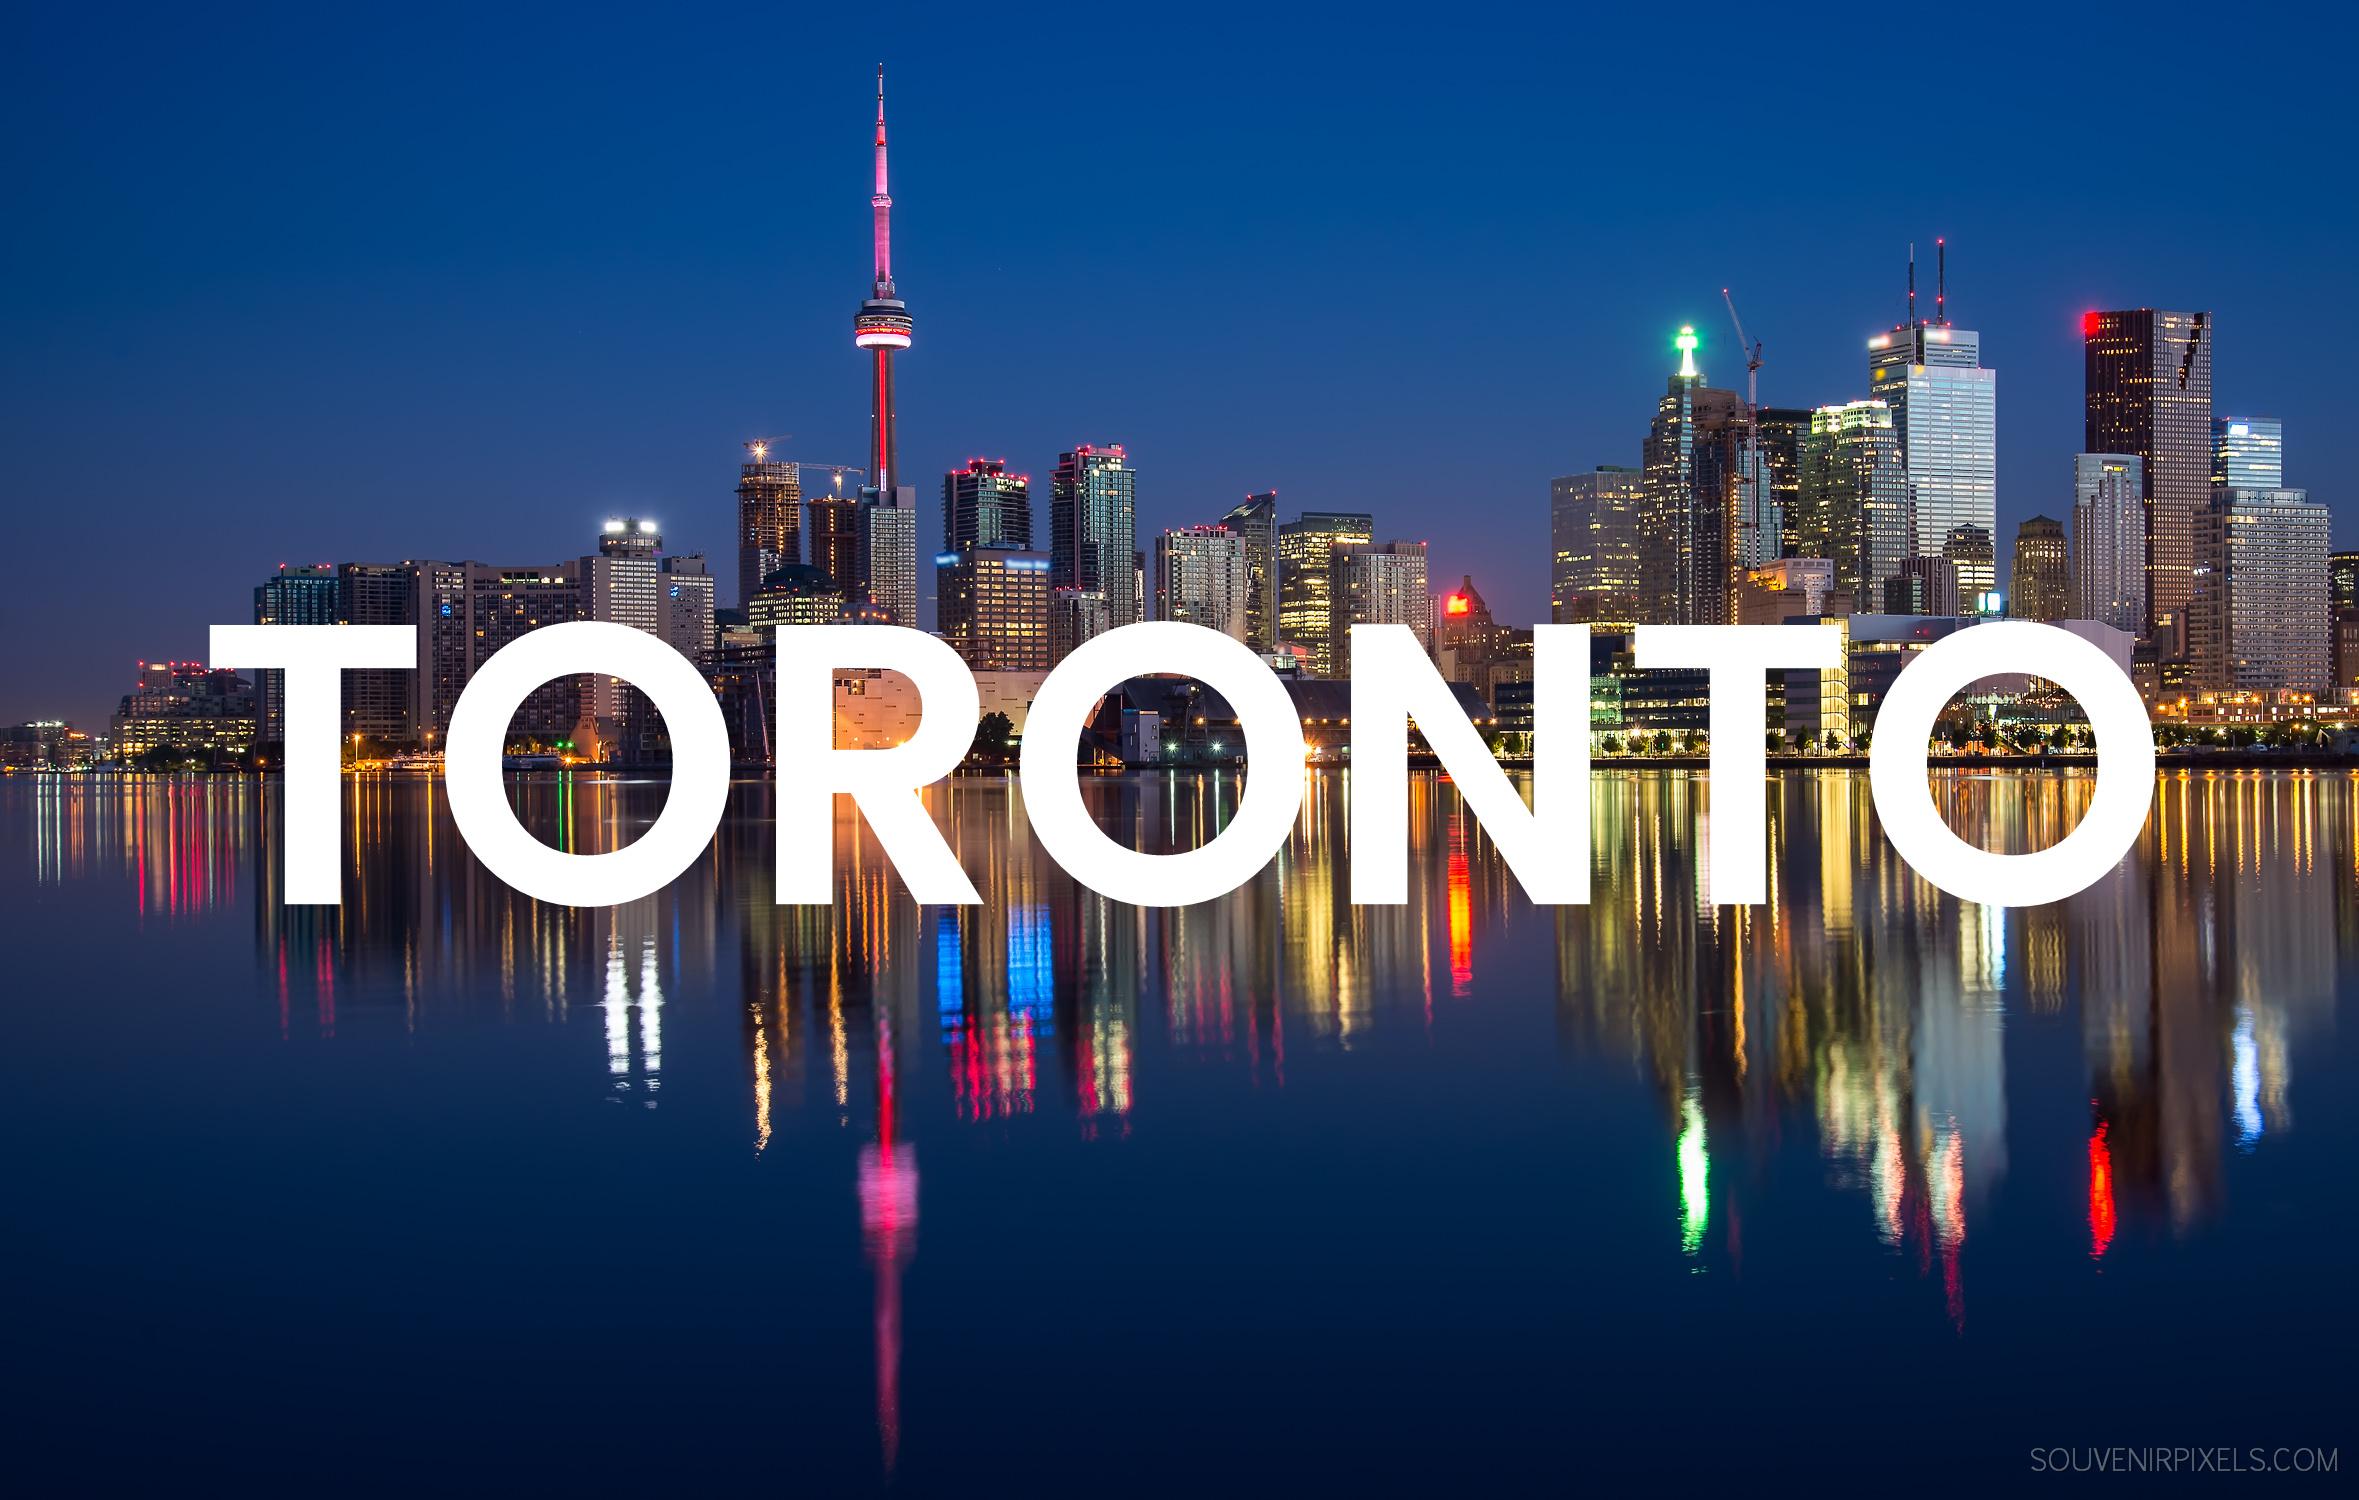 Toronto Storyline User Group Logo - Toronto Skyline at Dusk